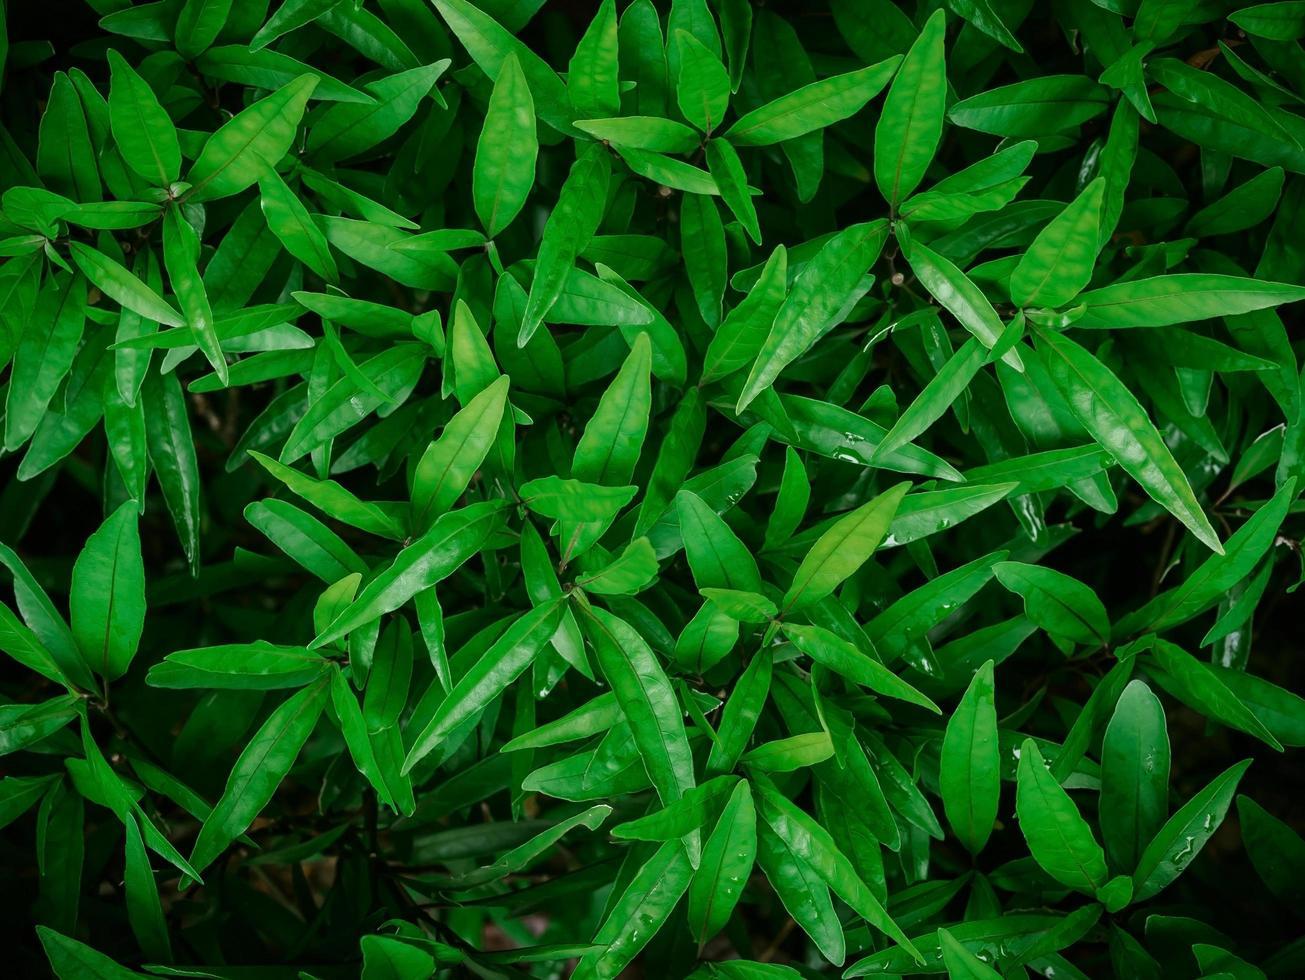 groene lavas van plant, abstracte achtergrond textuur concepten. foto